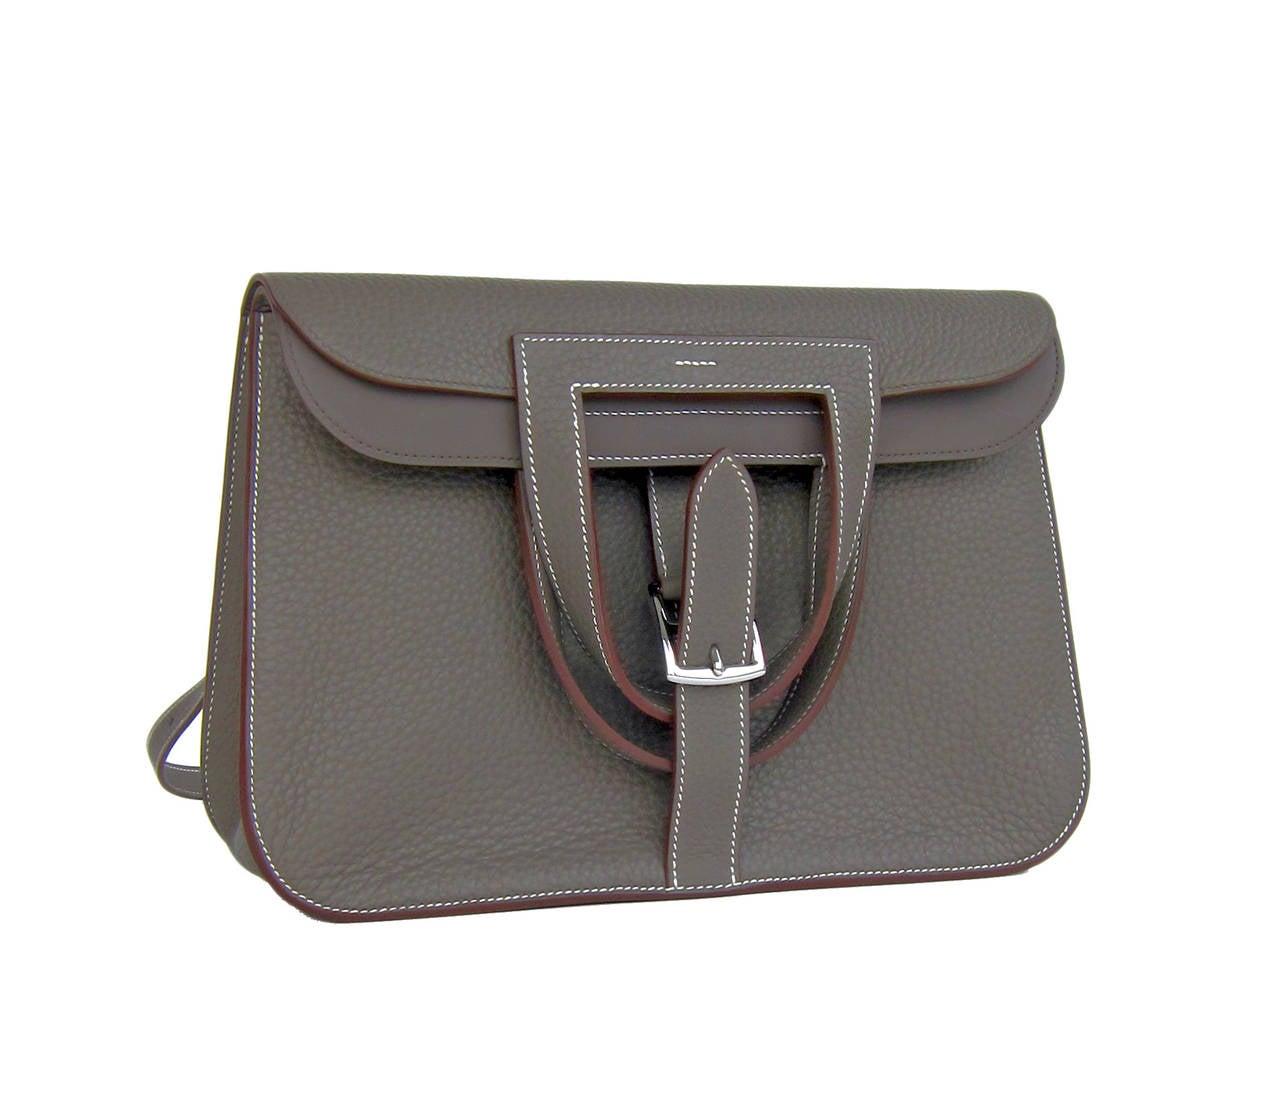 5d183287c8f8 Hermes Etain Grey Halzan 4-way Clemence Crossbody Bag Brand New in Box  Store fresh